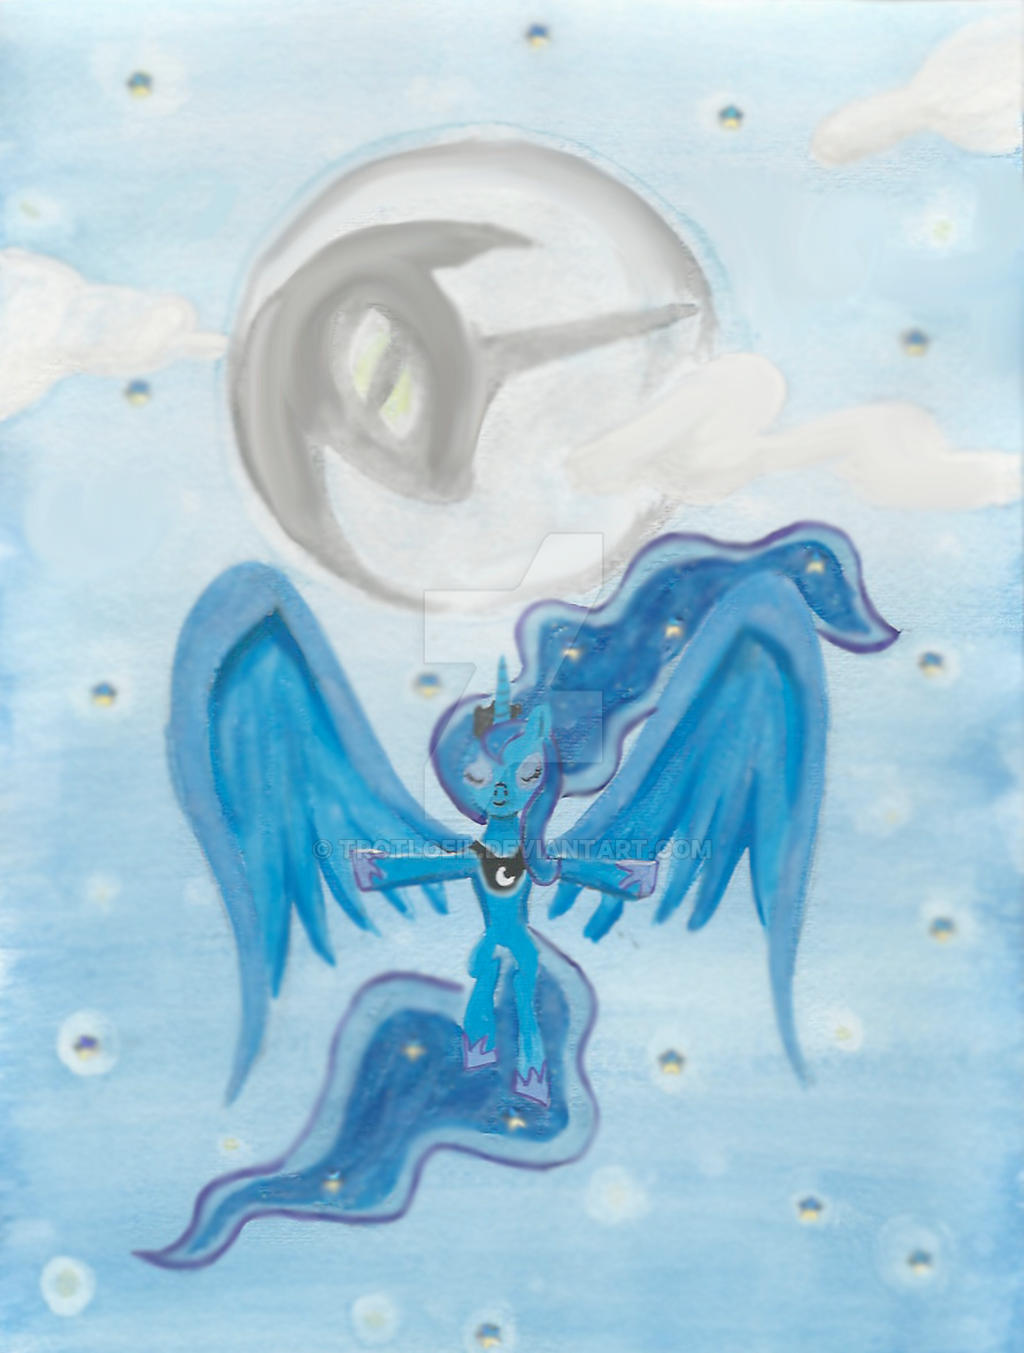 Princess Luna Guards the Night by TexacoPokerKitty